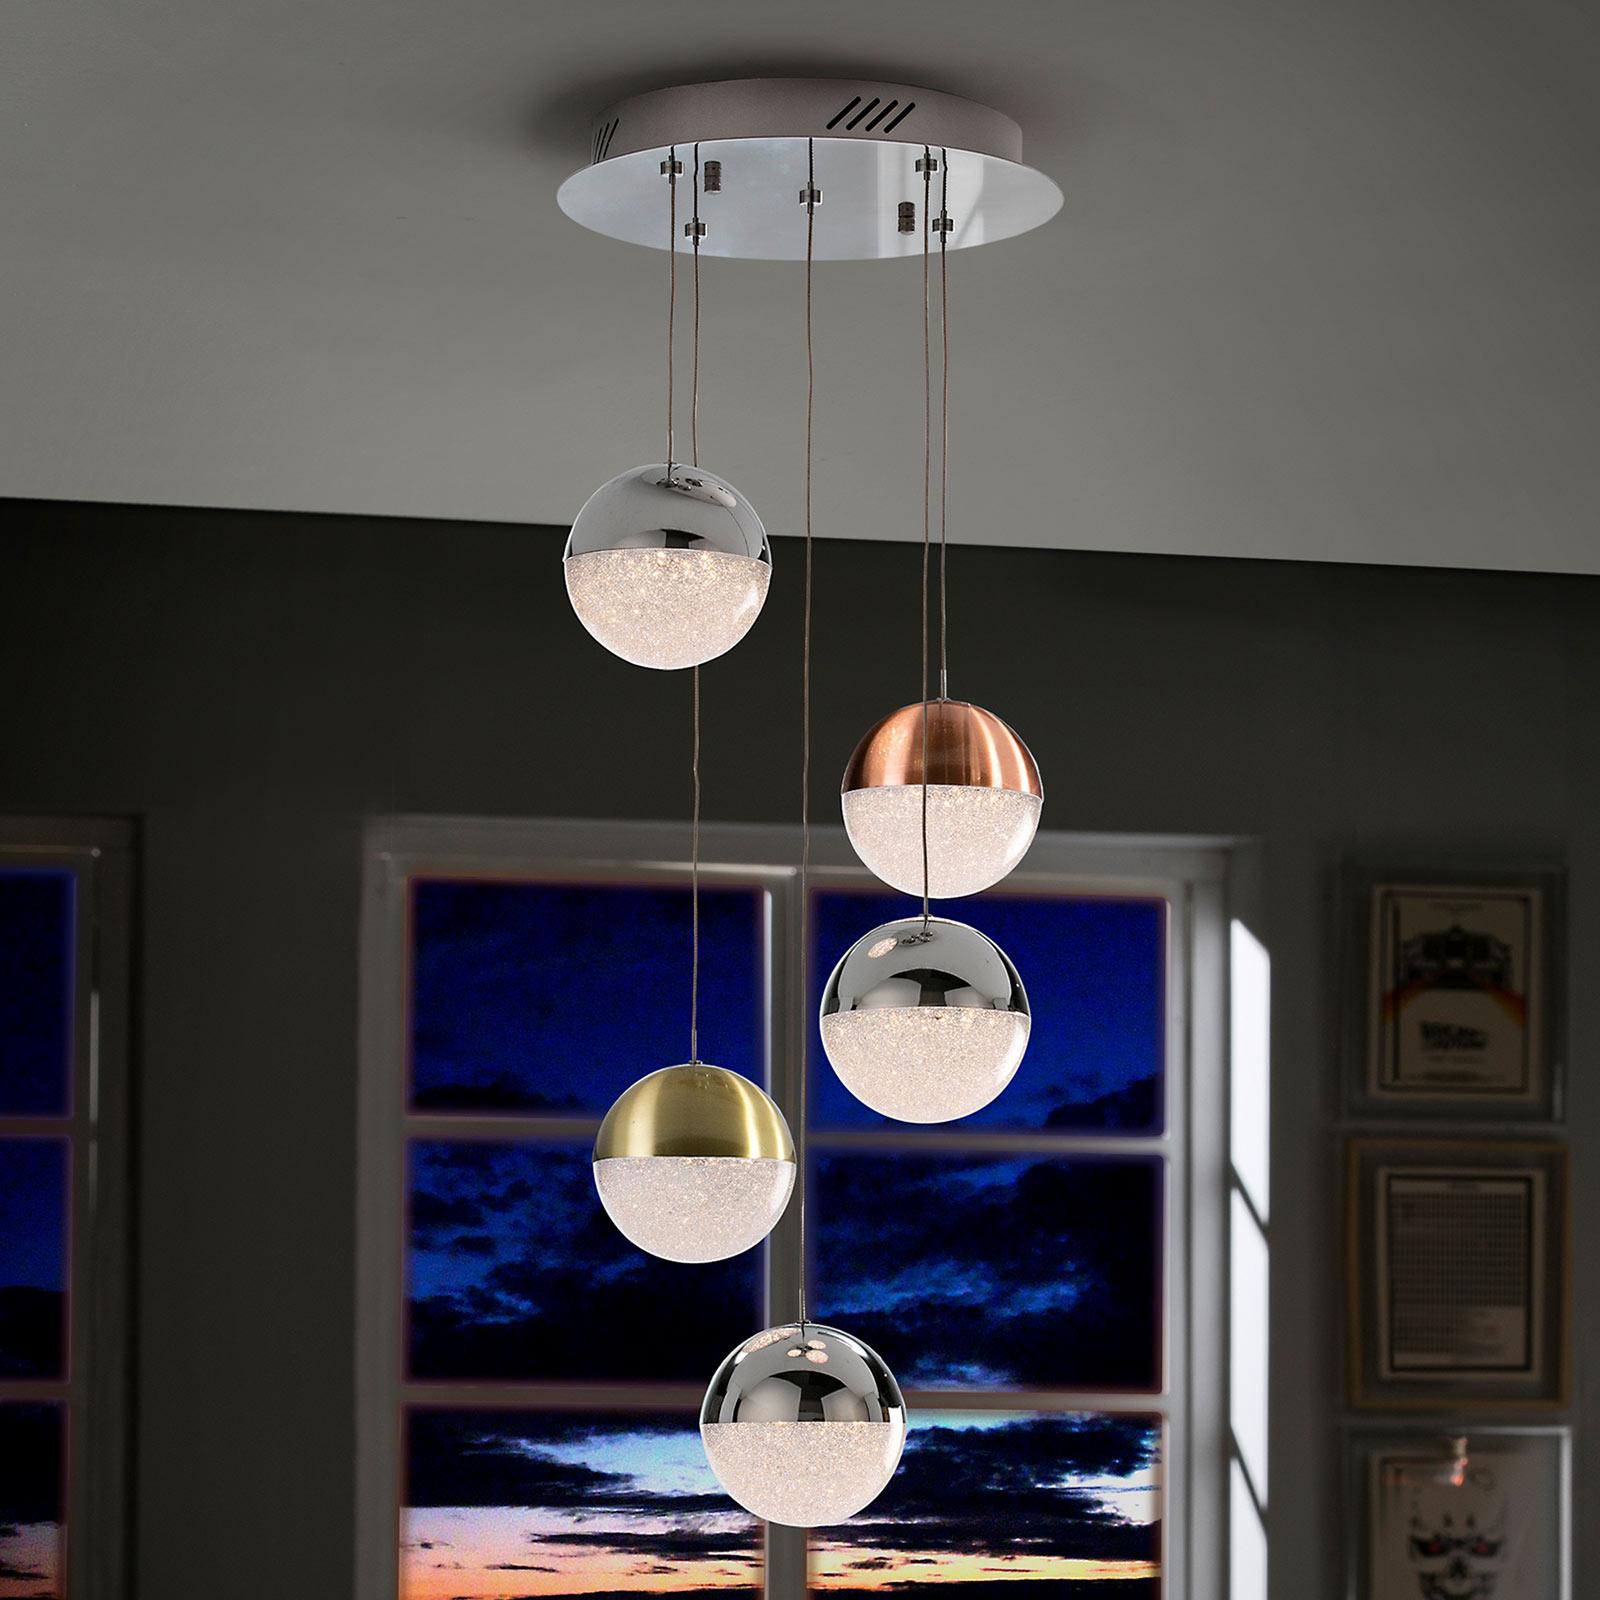 LED-Hängeleuchte Sphere, multicolour, fünfflammig